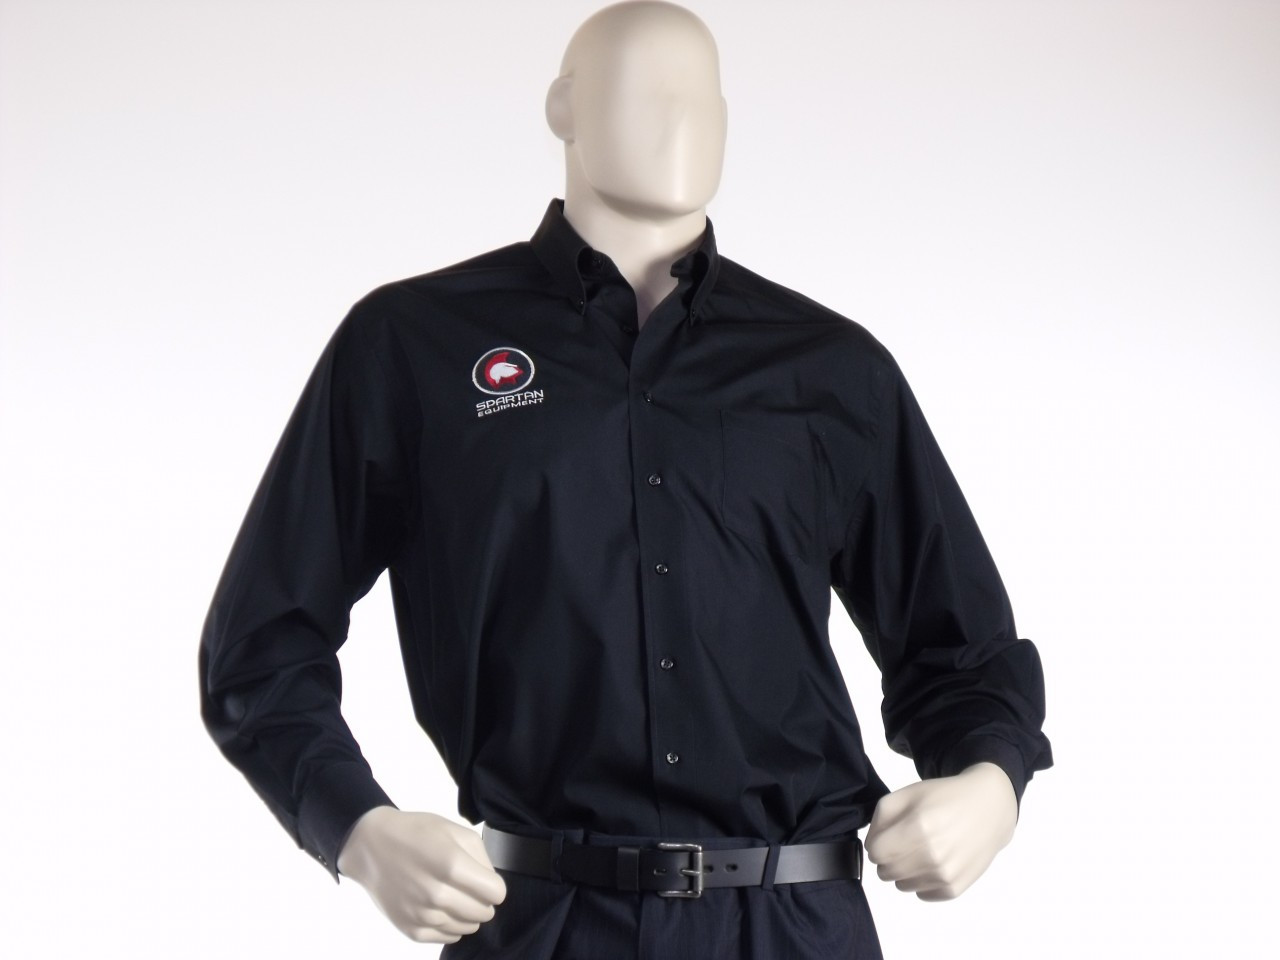 Spartan Dress Shirt Black